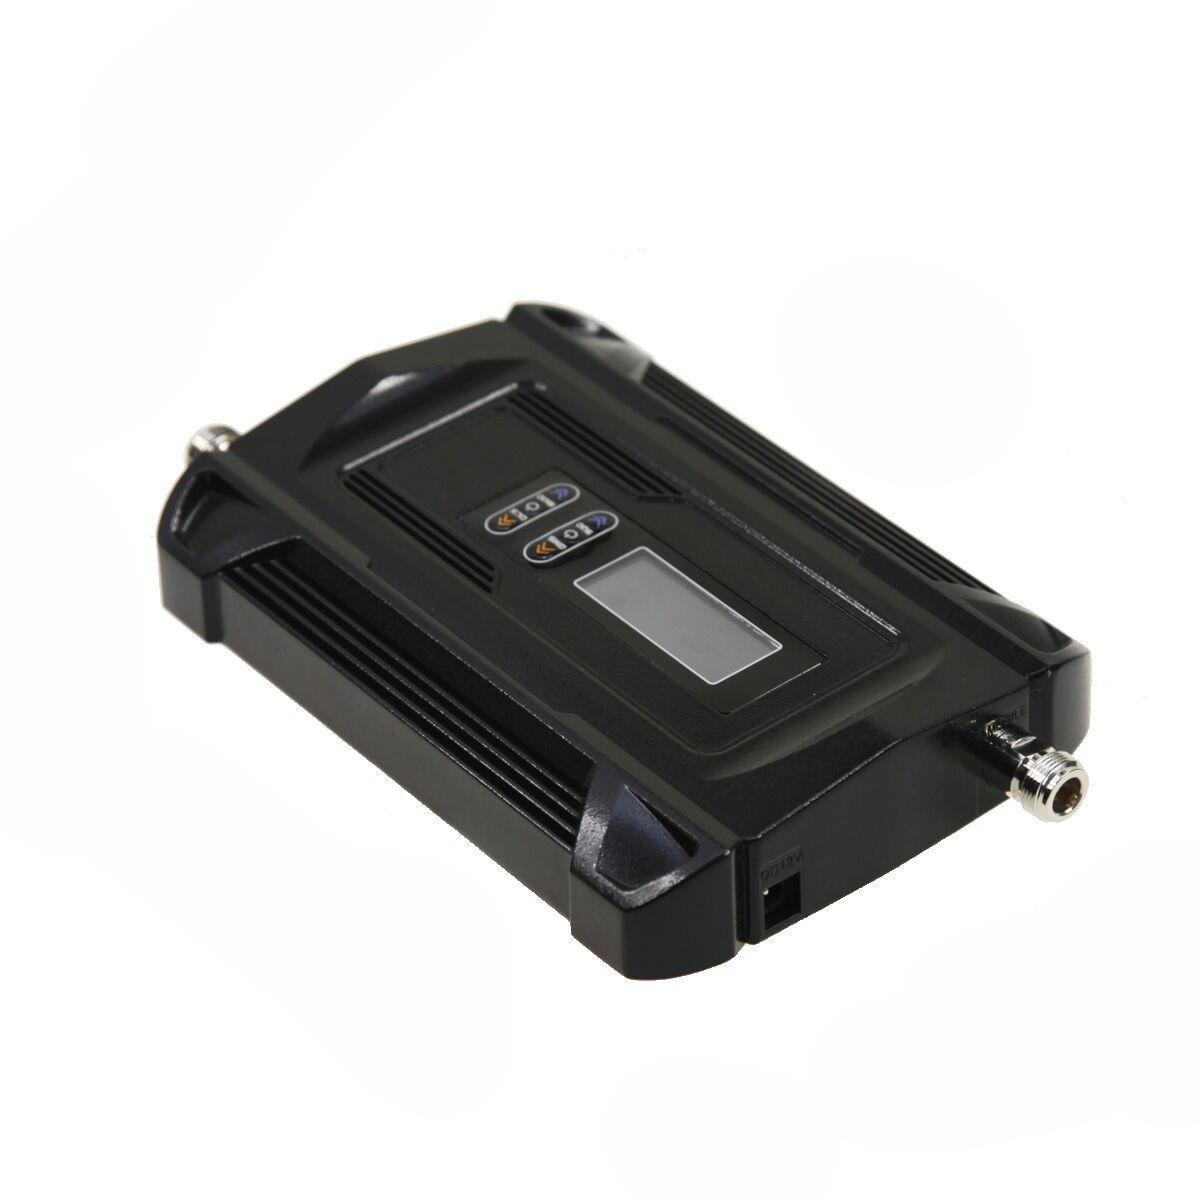 Pro 1800/2100MHz, O2/Vodafone/Three / EE 4G Lite - 500 sqm